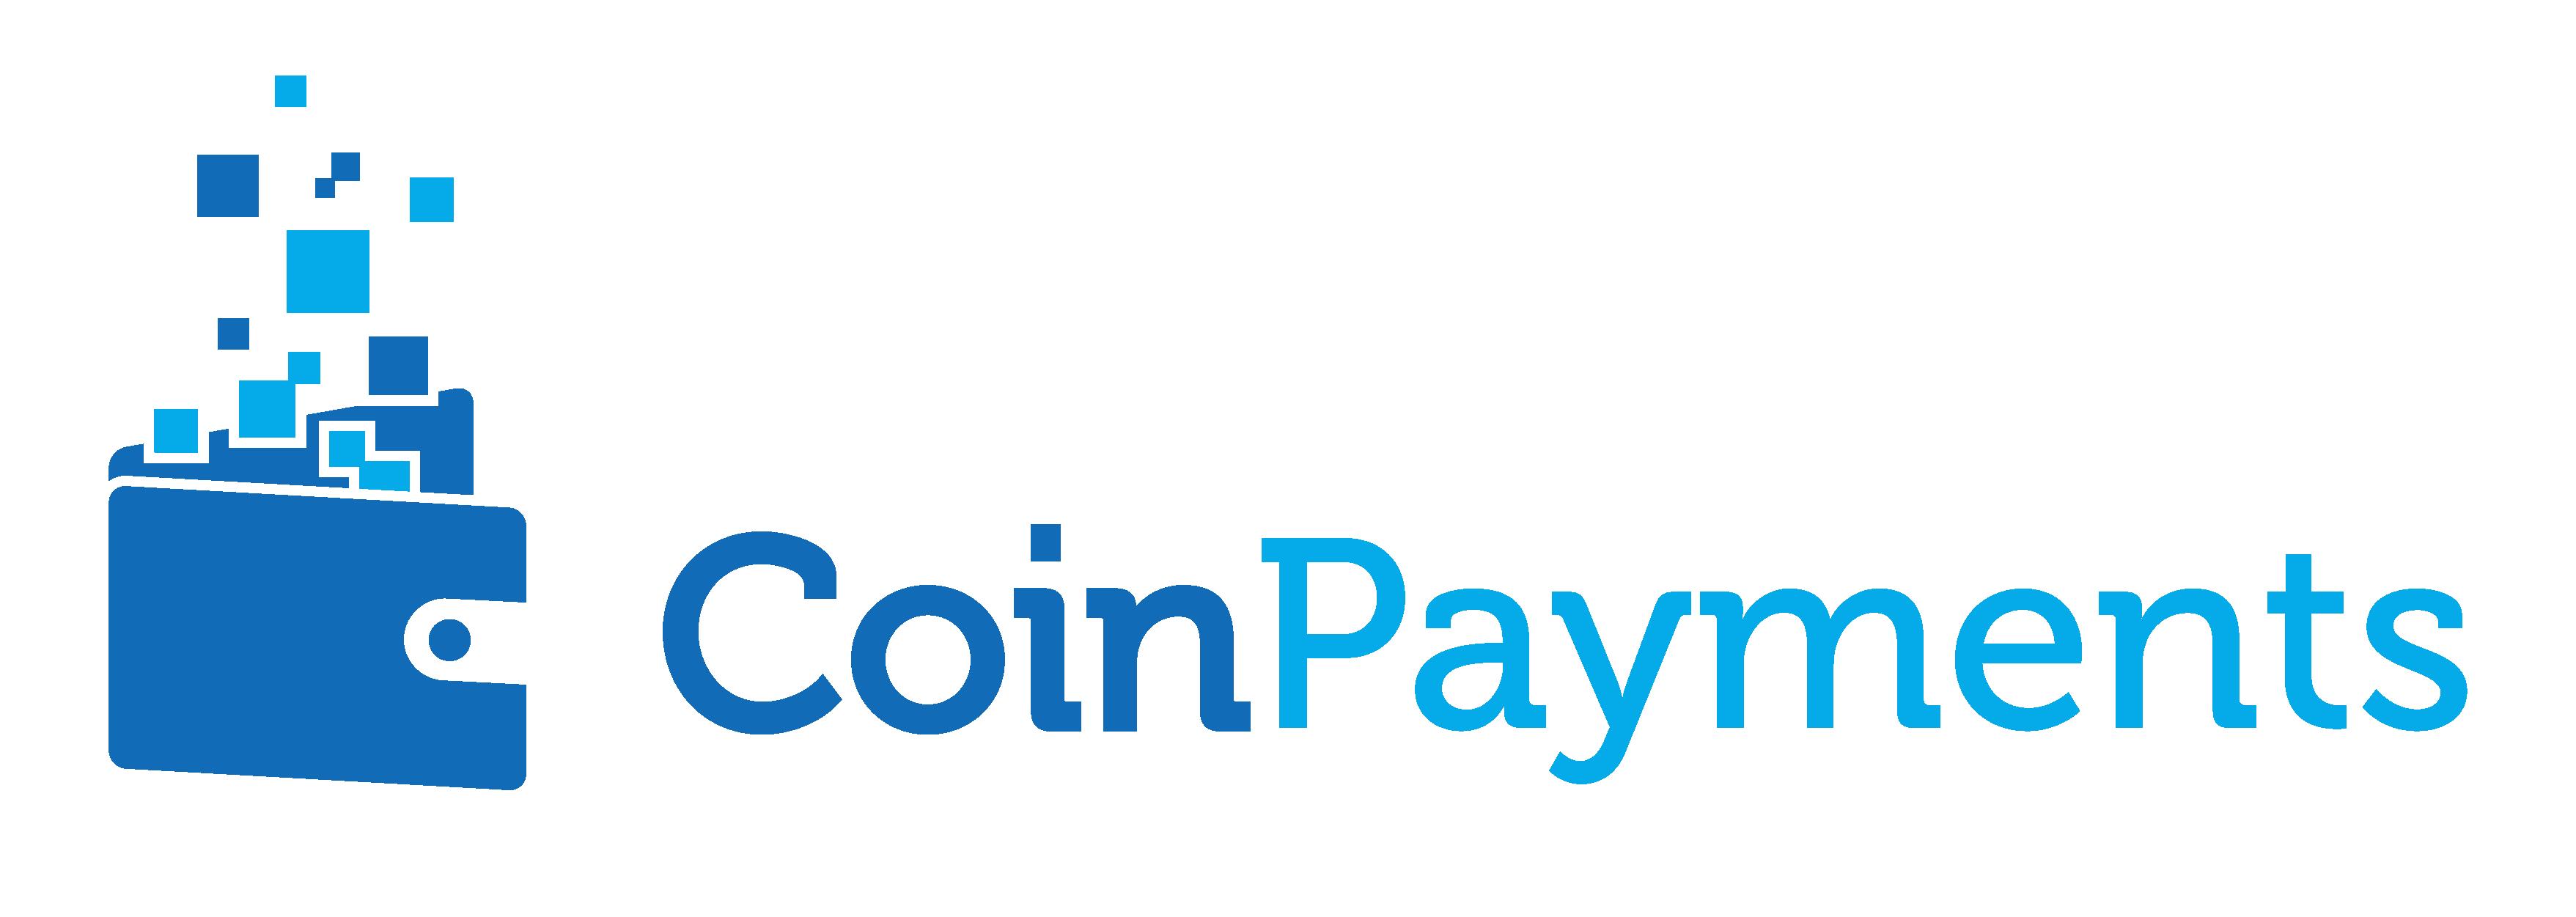 CoinPayments Wallet Logo